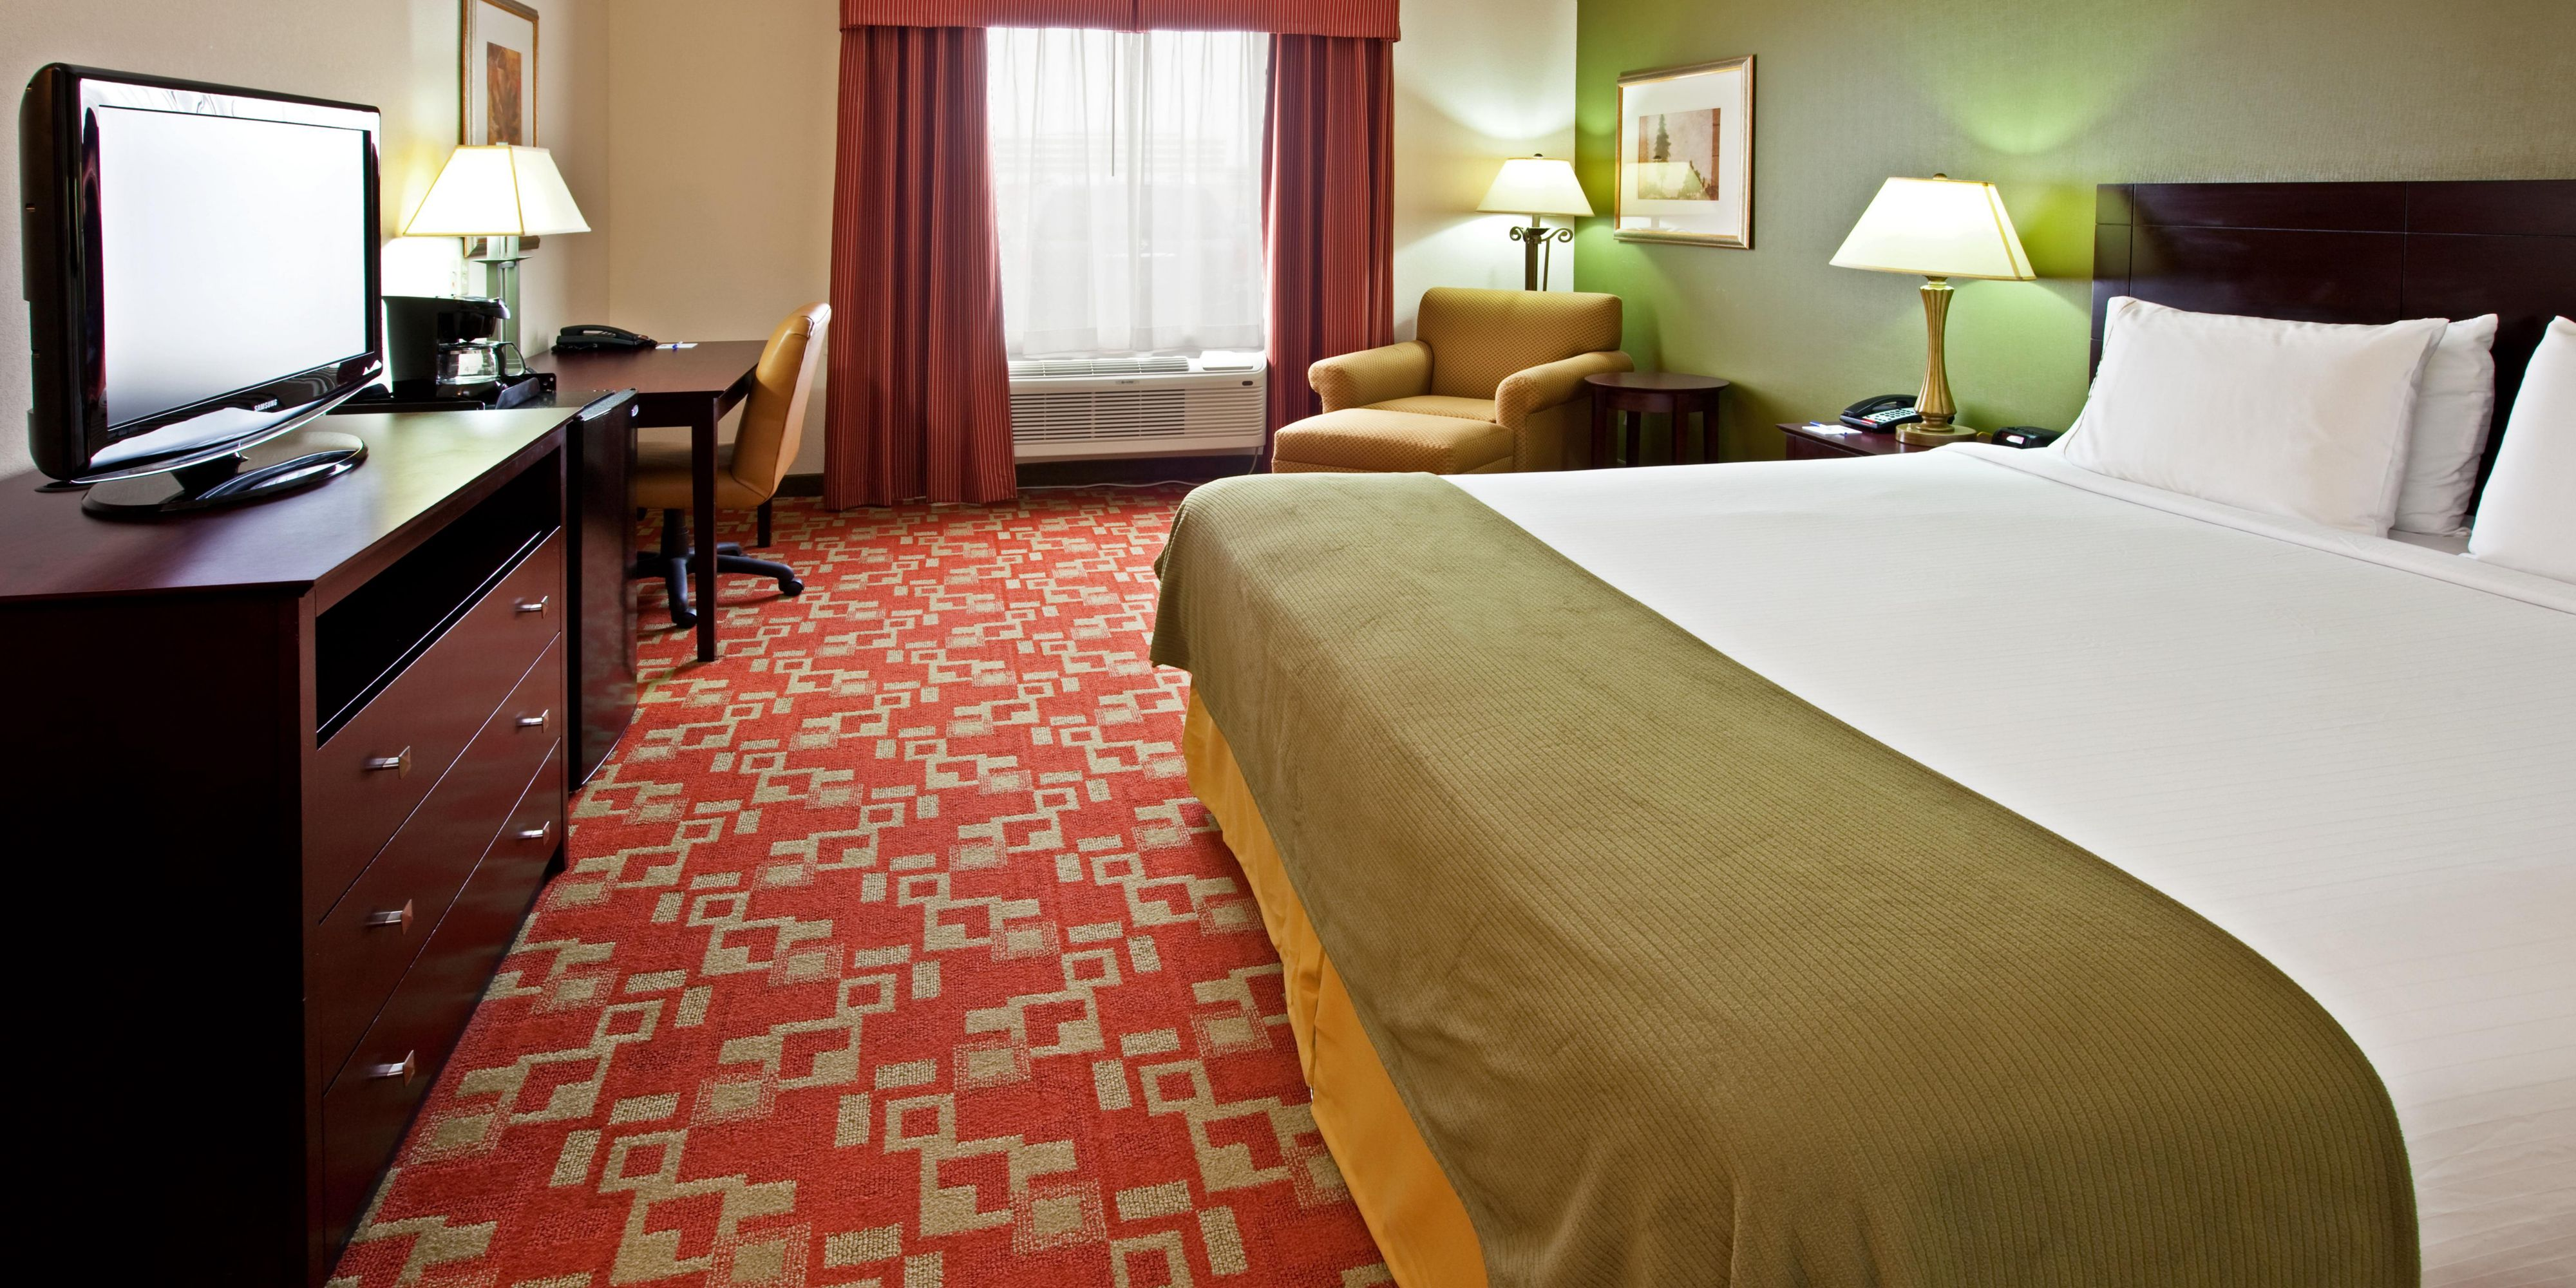 Holiday Inn Express Vincennes 2533319622 2x1